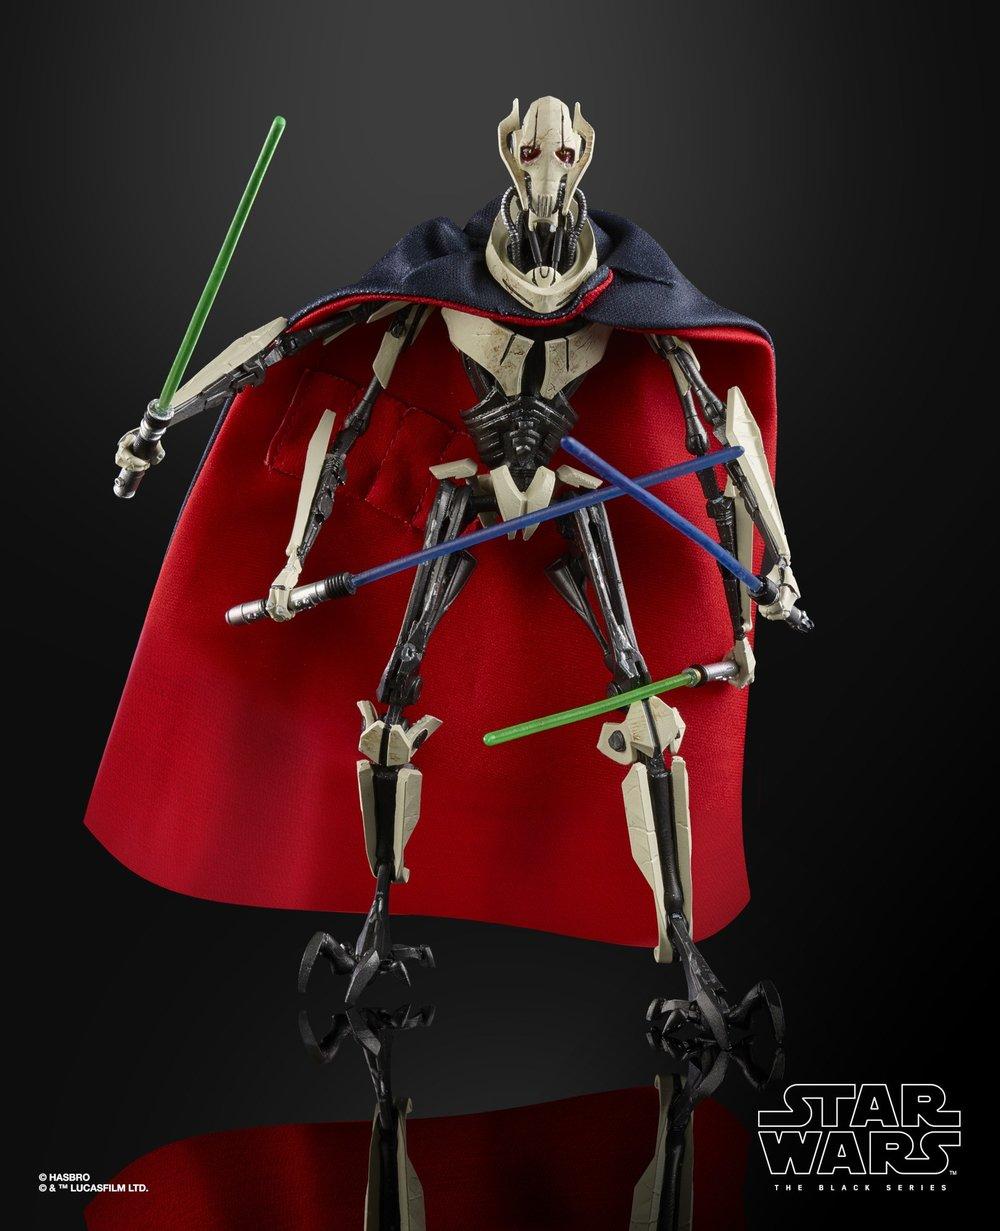 Star-Wars-The-Black-Series-6-inch-General-Grievous-Figure-Promo-01.jpg